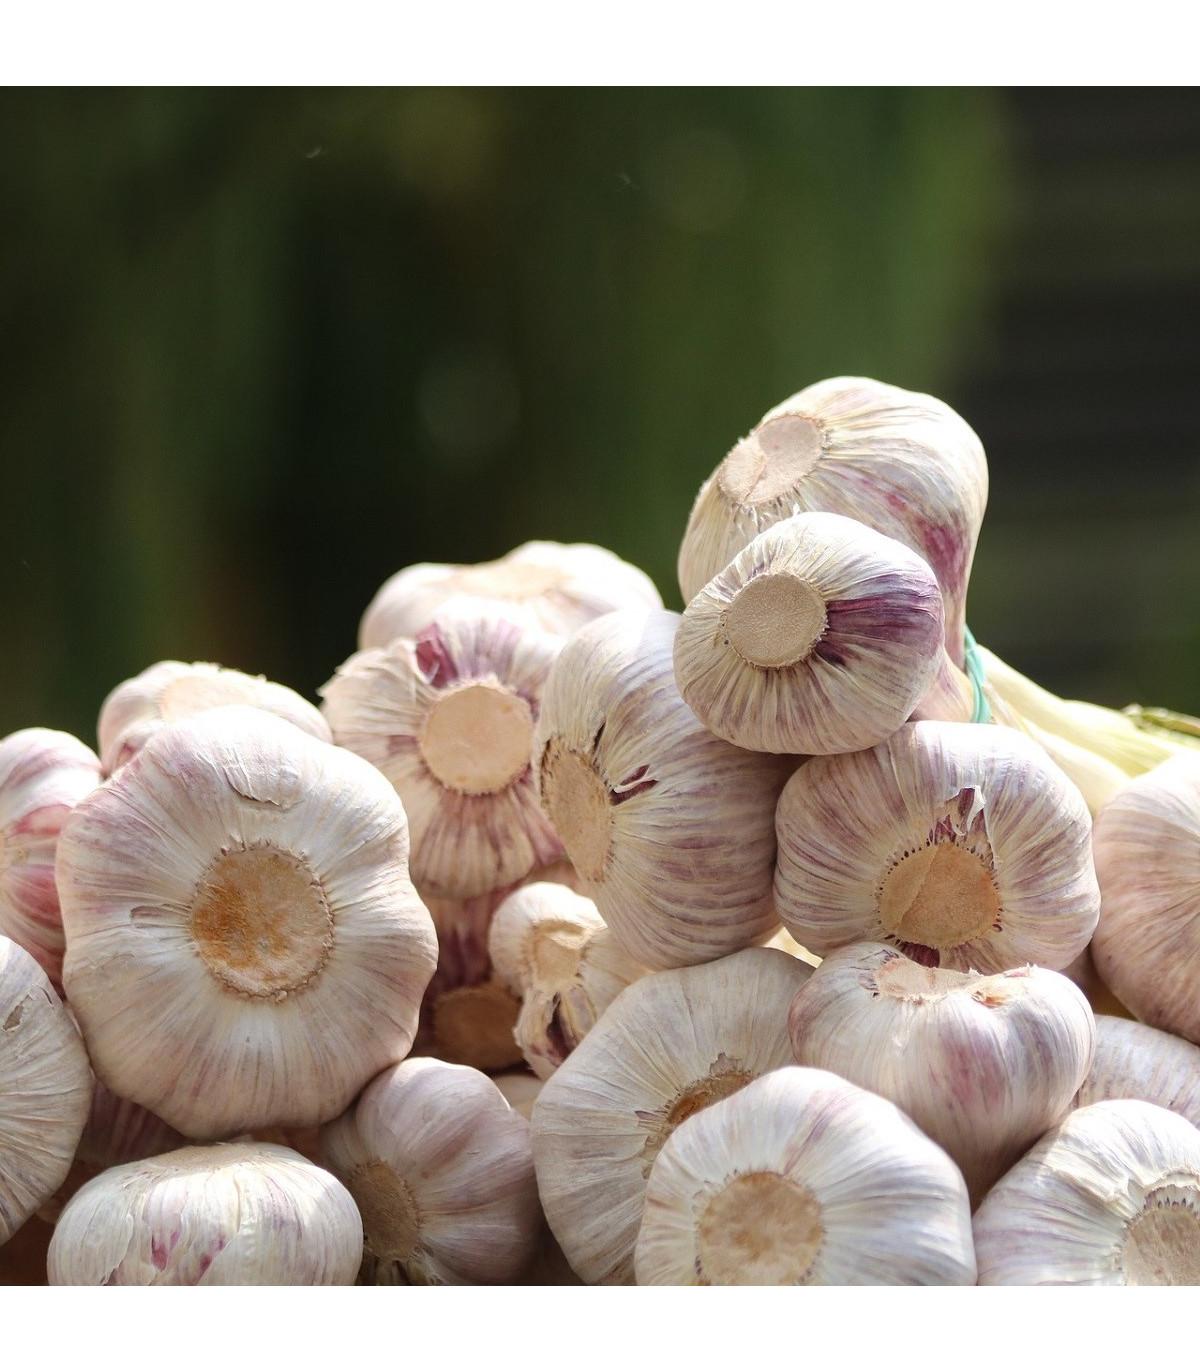 Sadbový cesnak Anton - Allium sativum - nepaličiak - predaj cibulí cesnaku - 4 ks